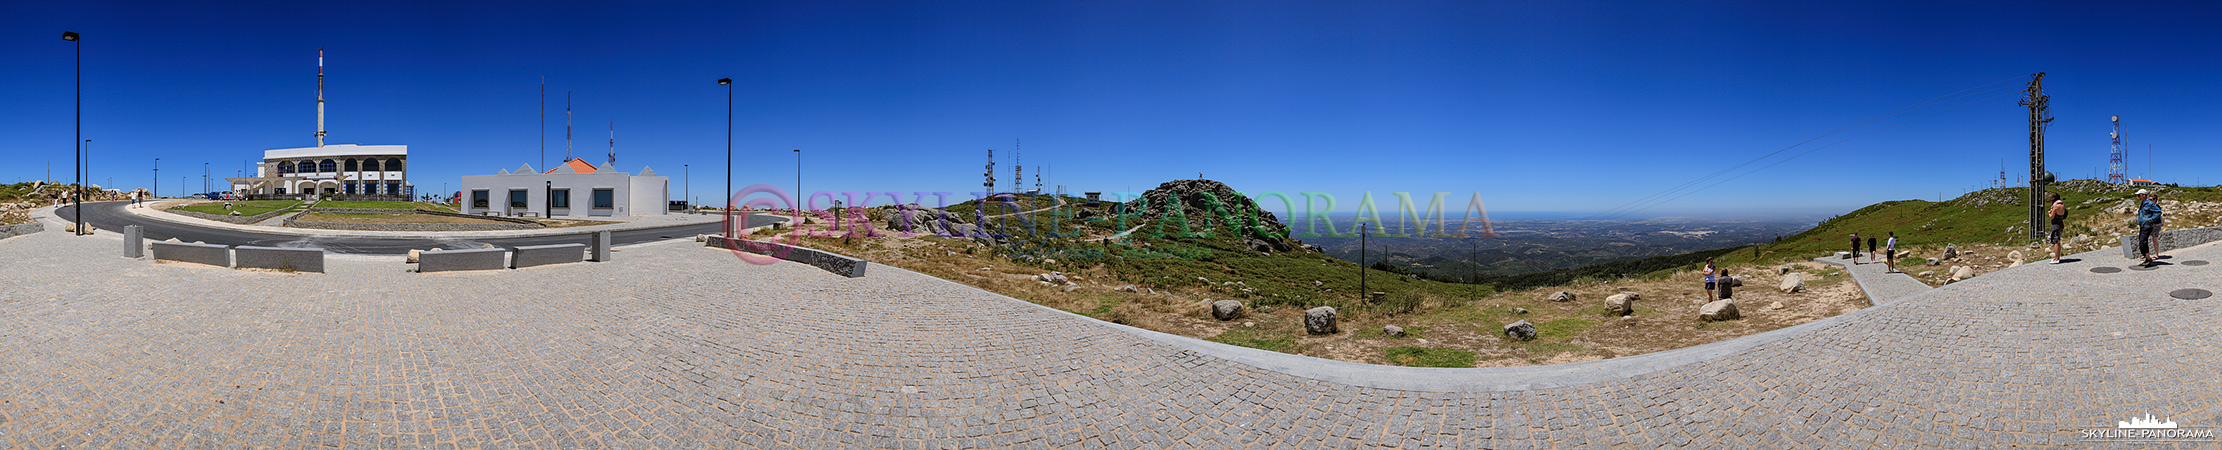 Monchiquegebirge Fóia